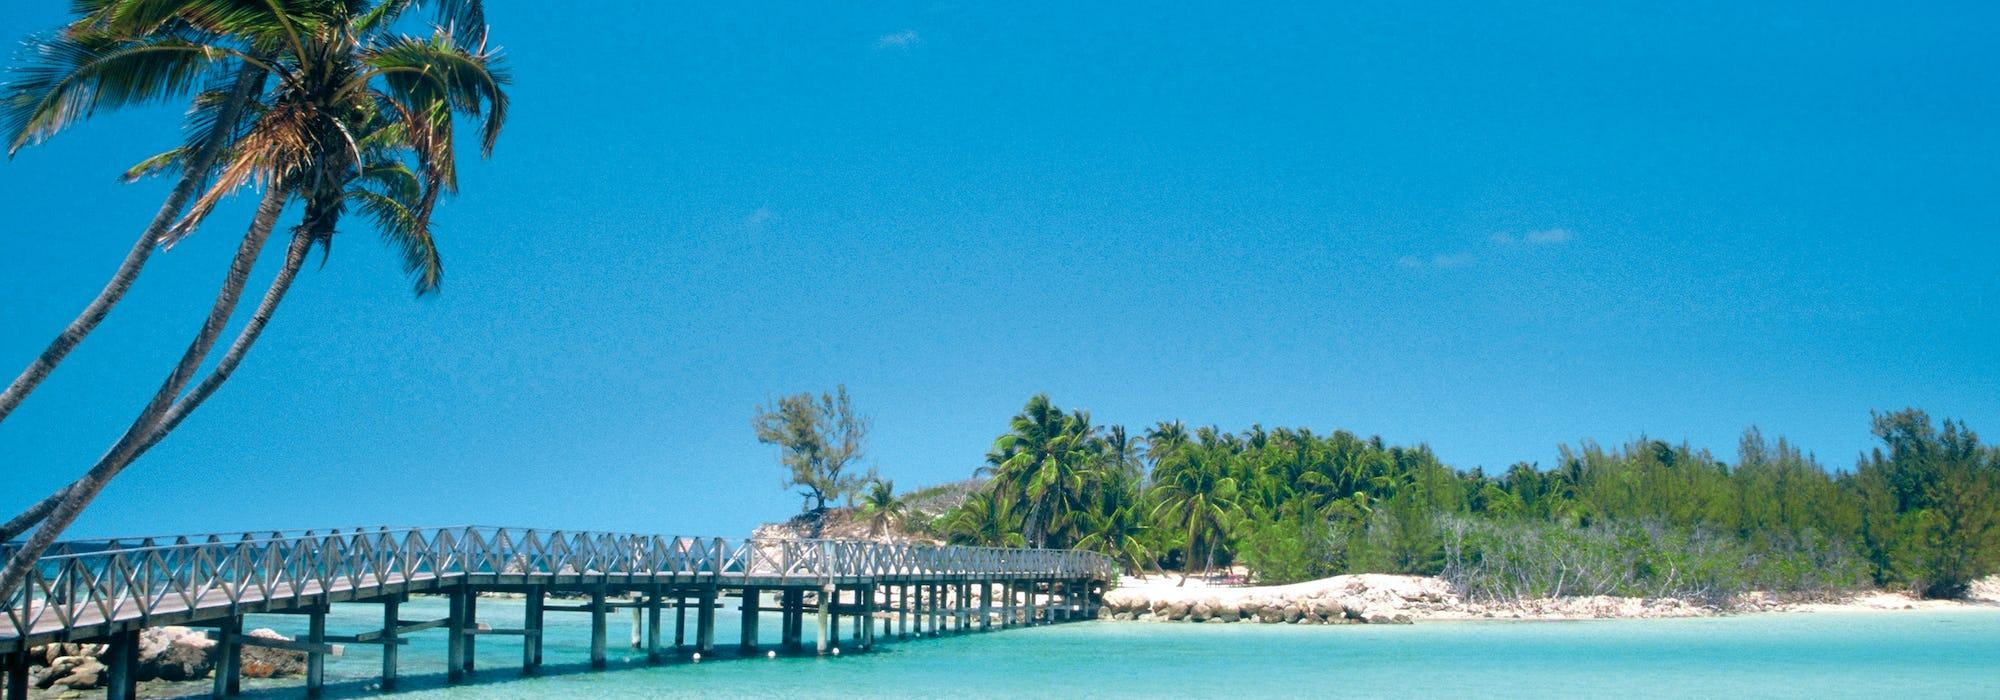 Nassau, Bahamasaaret